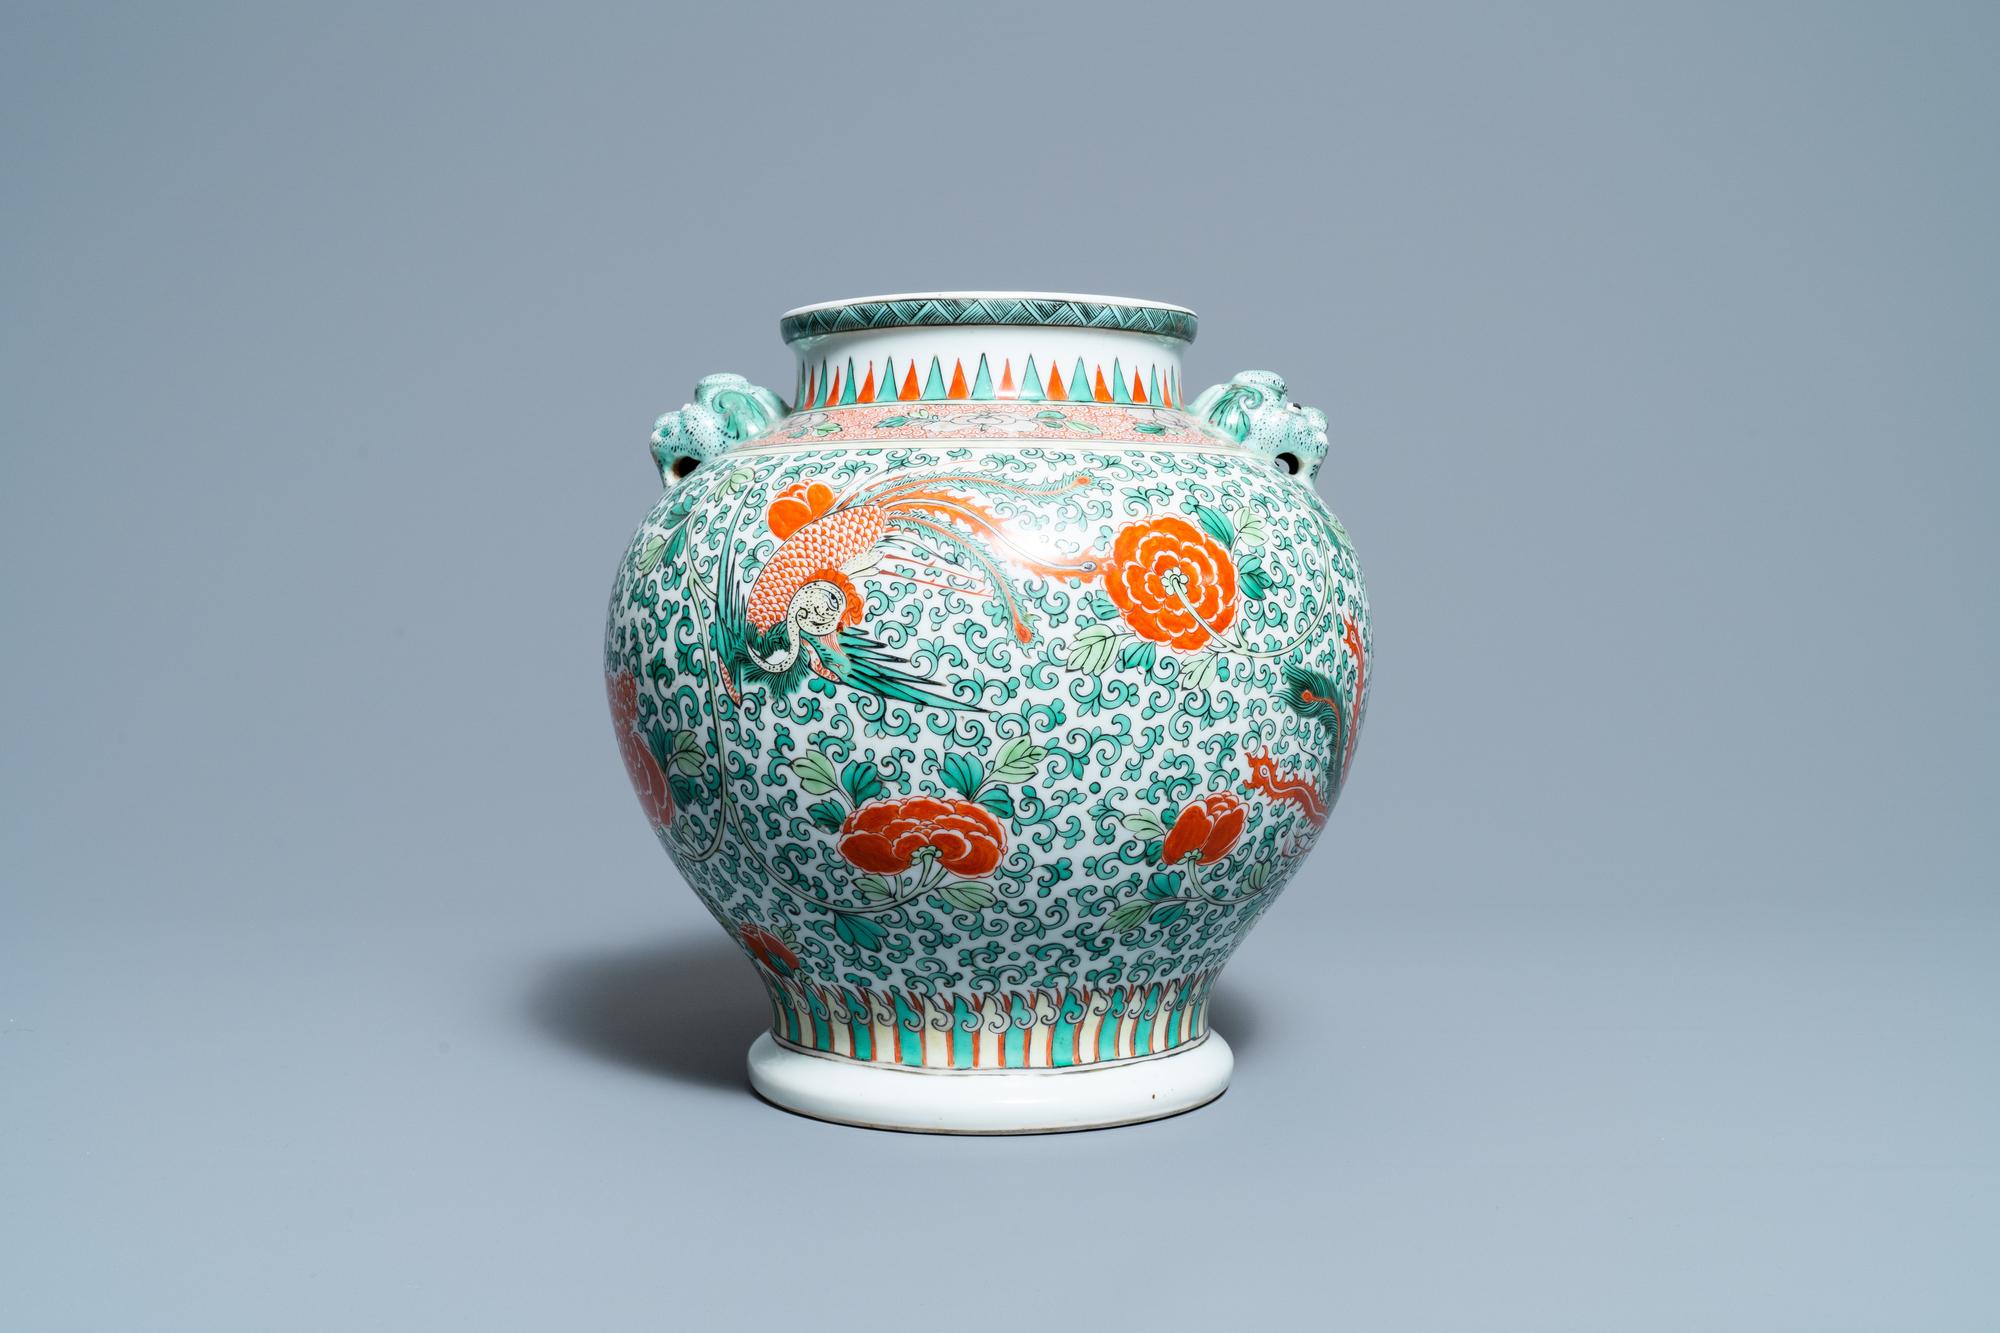 A Chinese 'wucai' phoenix vase, Chenghua mark, 19th C. - Image 3 of 6